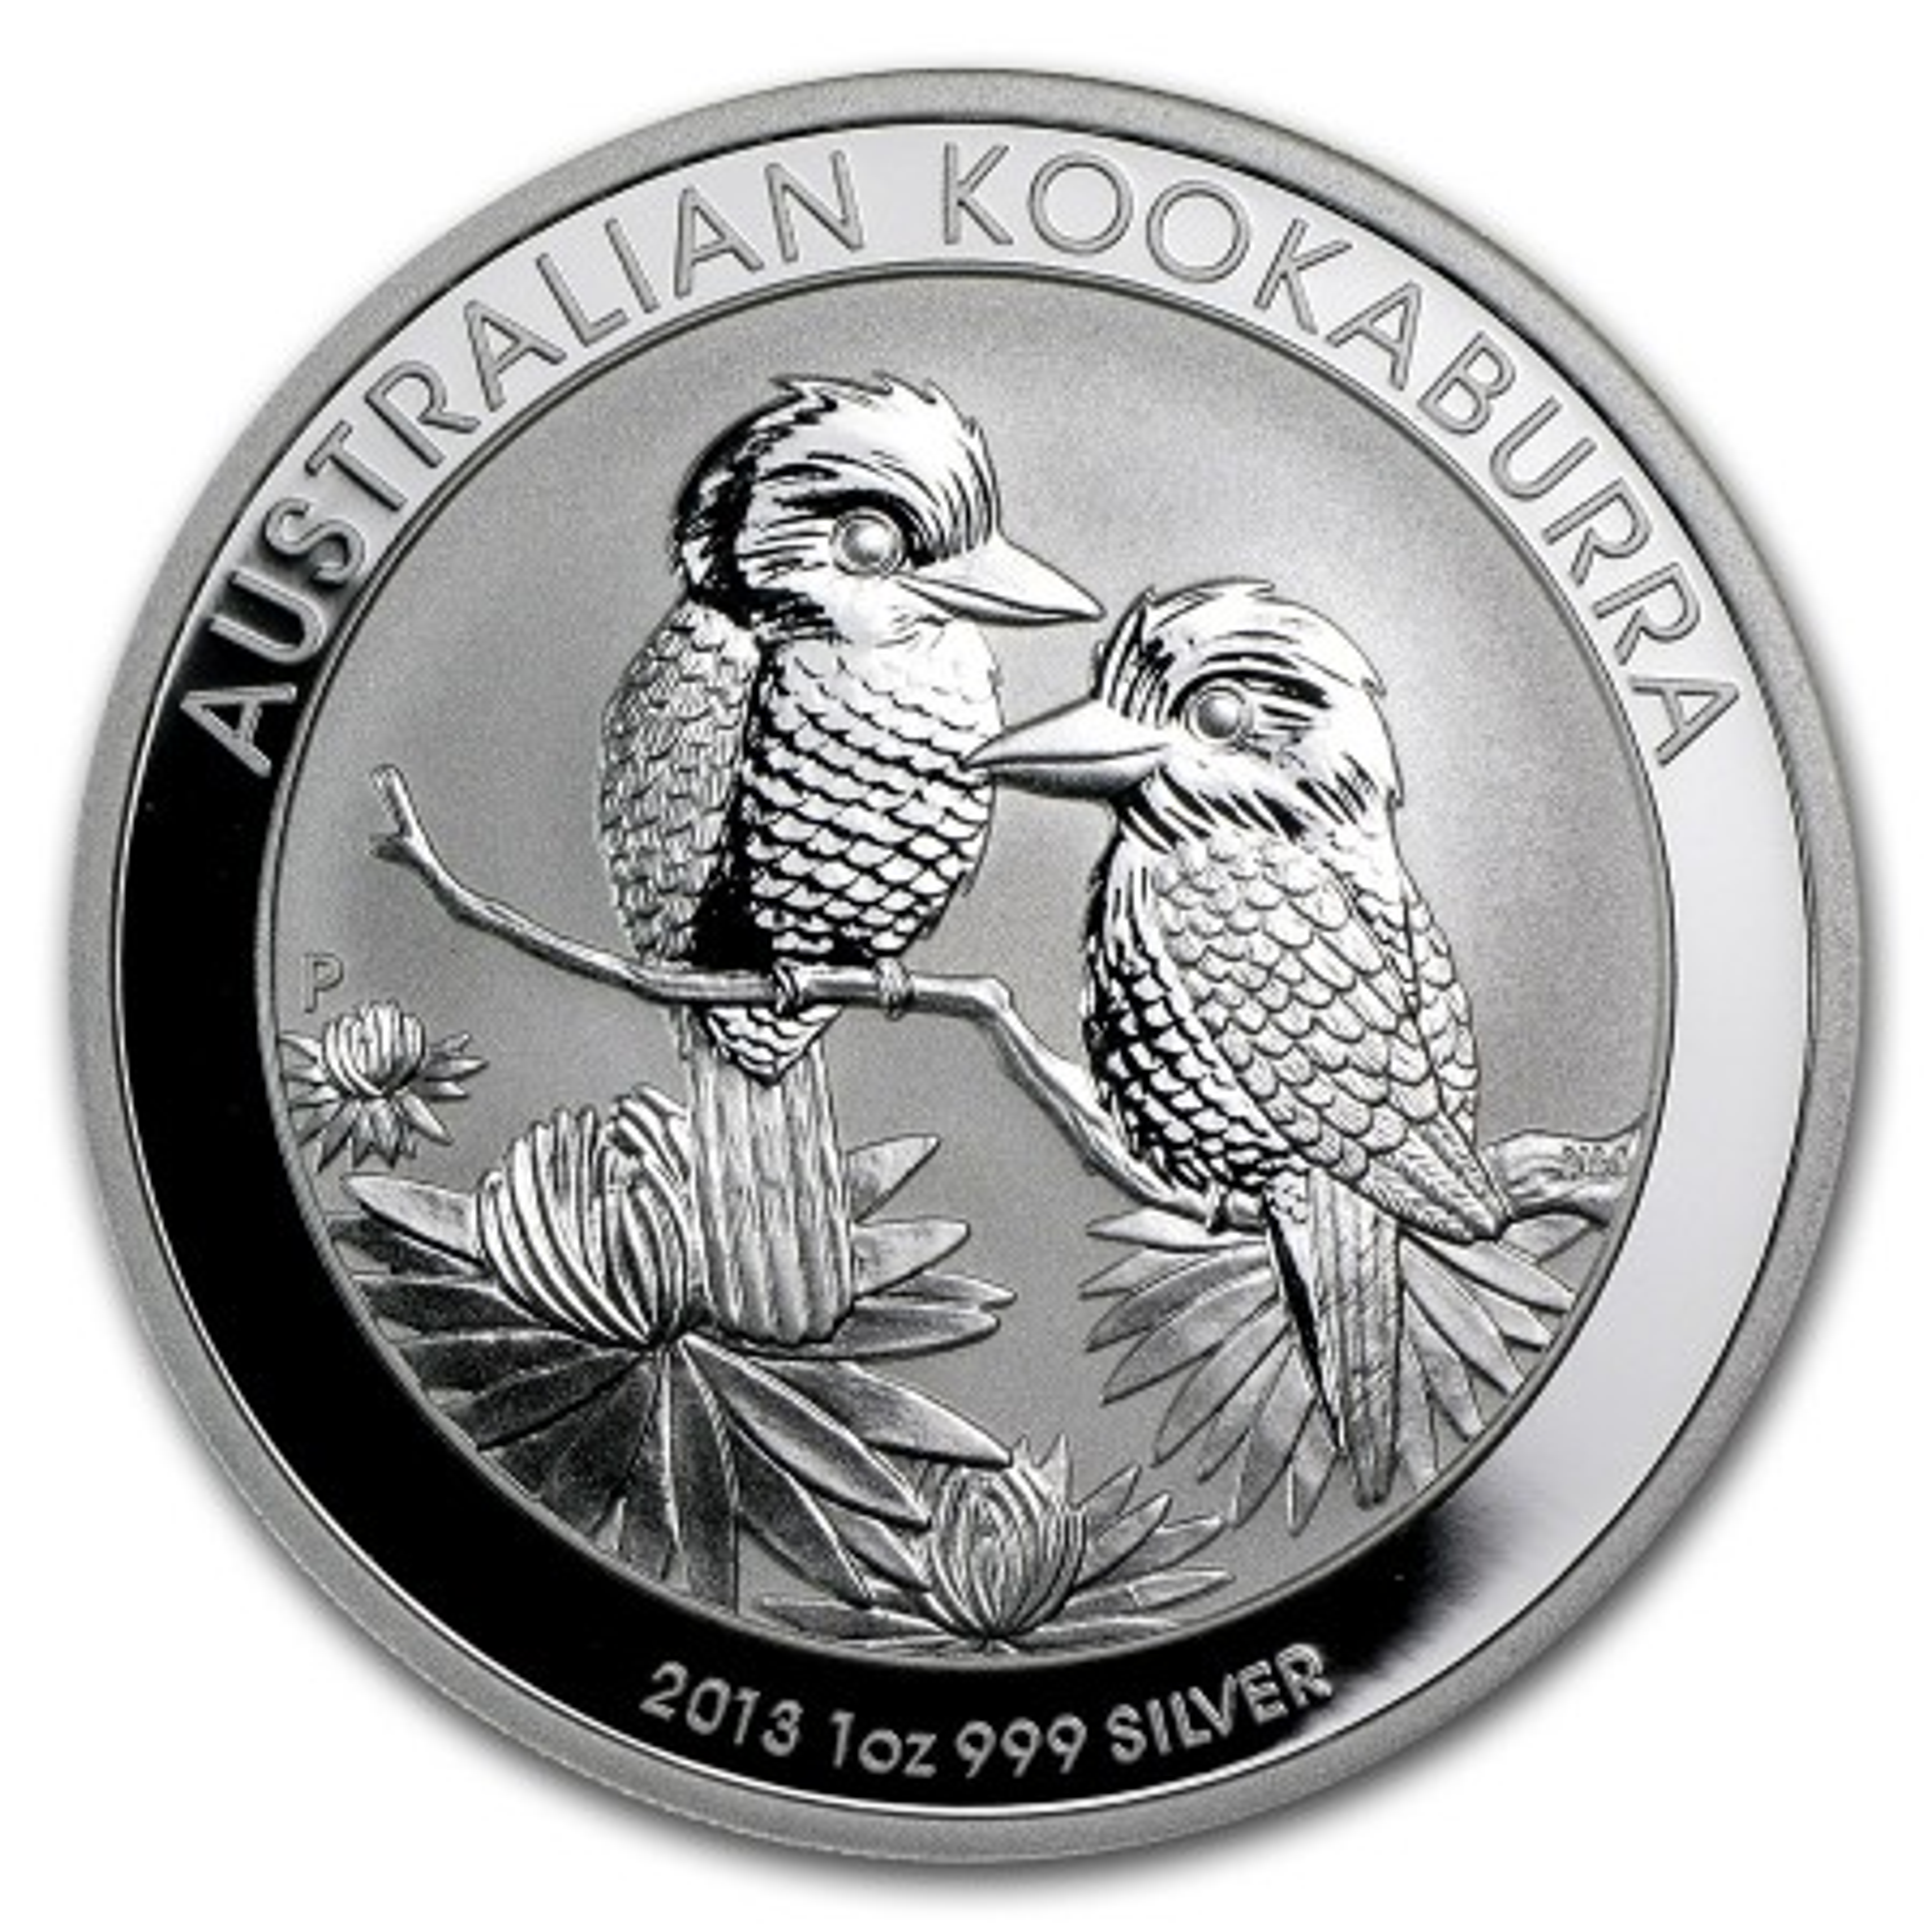 1 Troy ounce zilver munt Kookaburra 2013